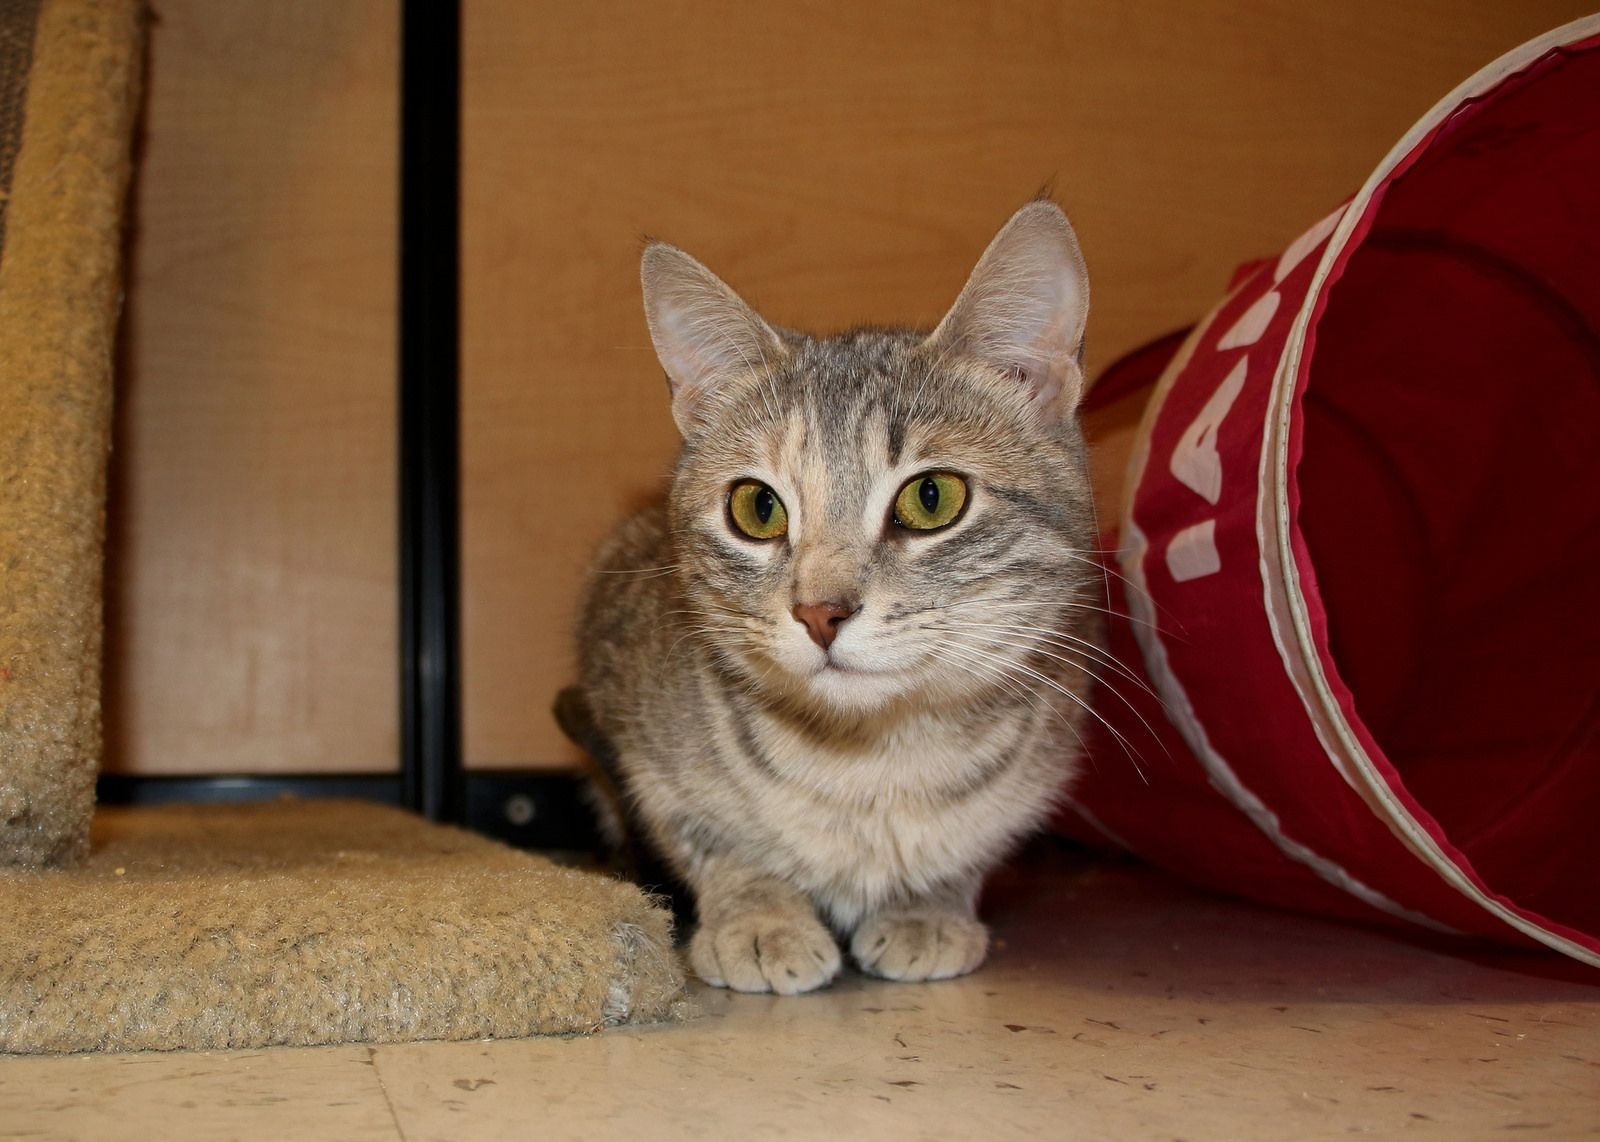 Felicity Scat Petsmart Adoption Centre Cat Adoption Cat Photo Adoption Center